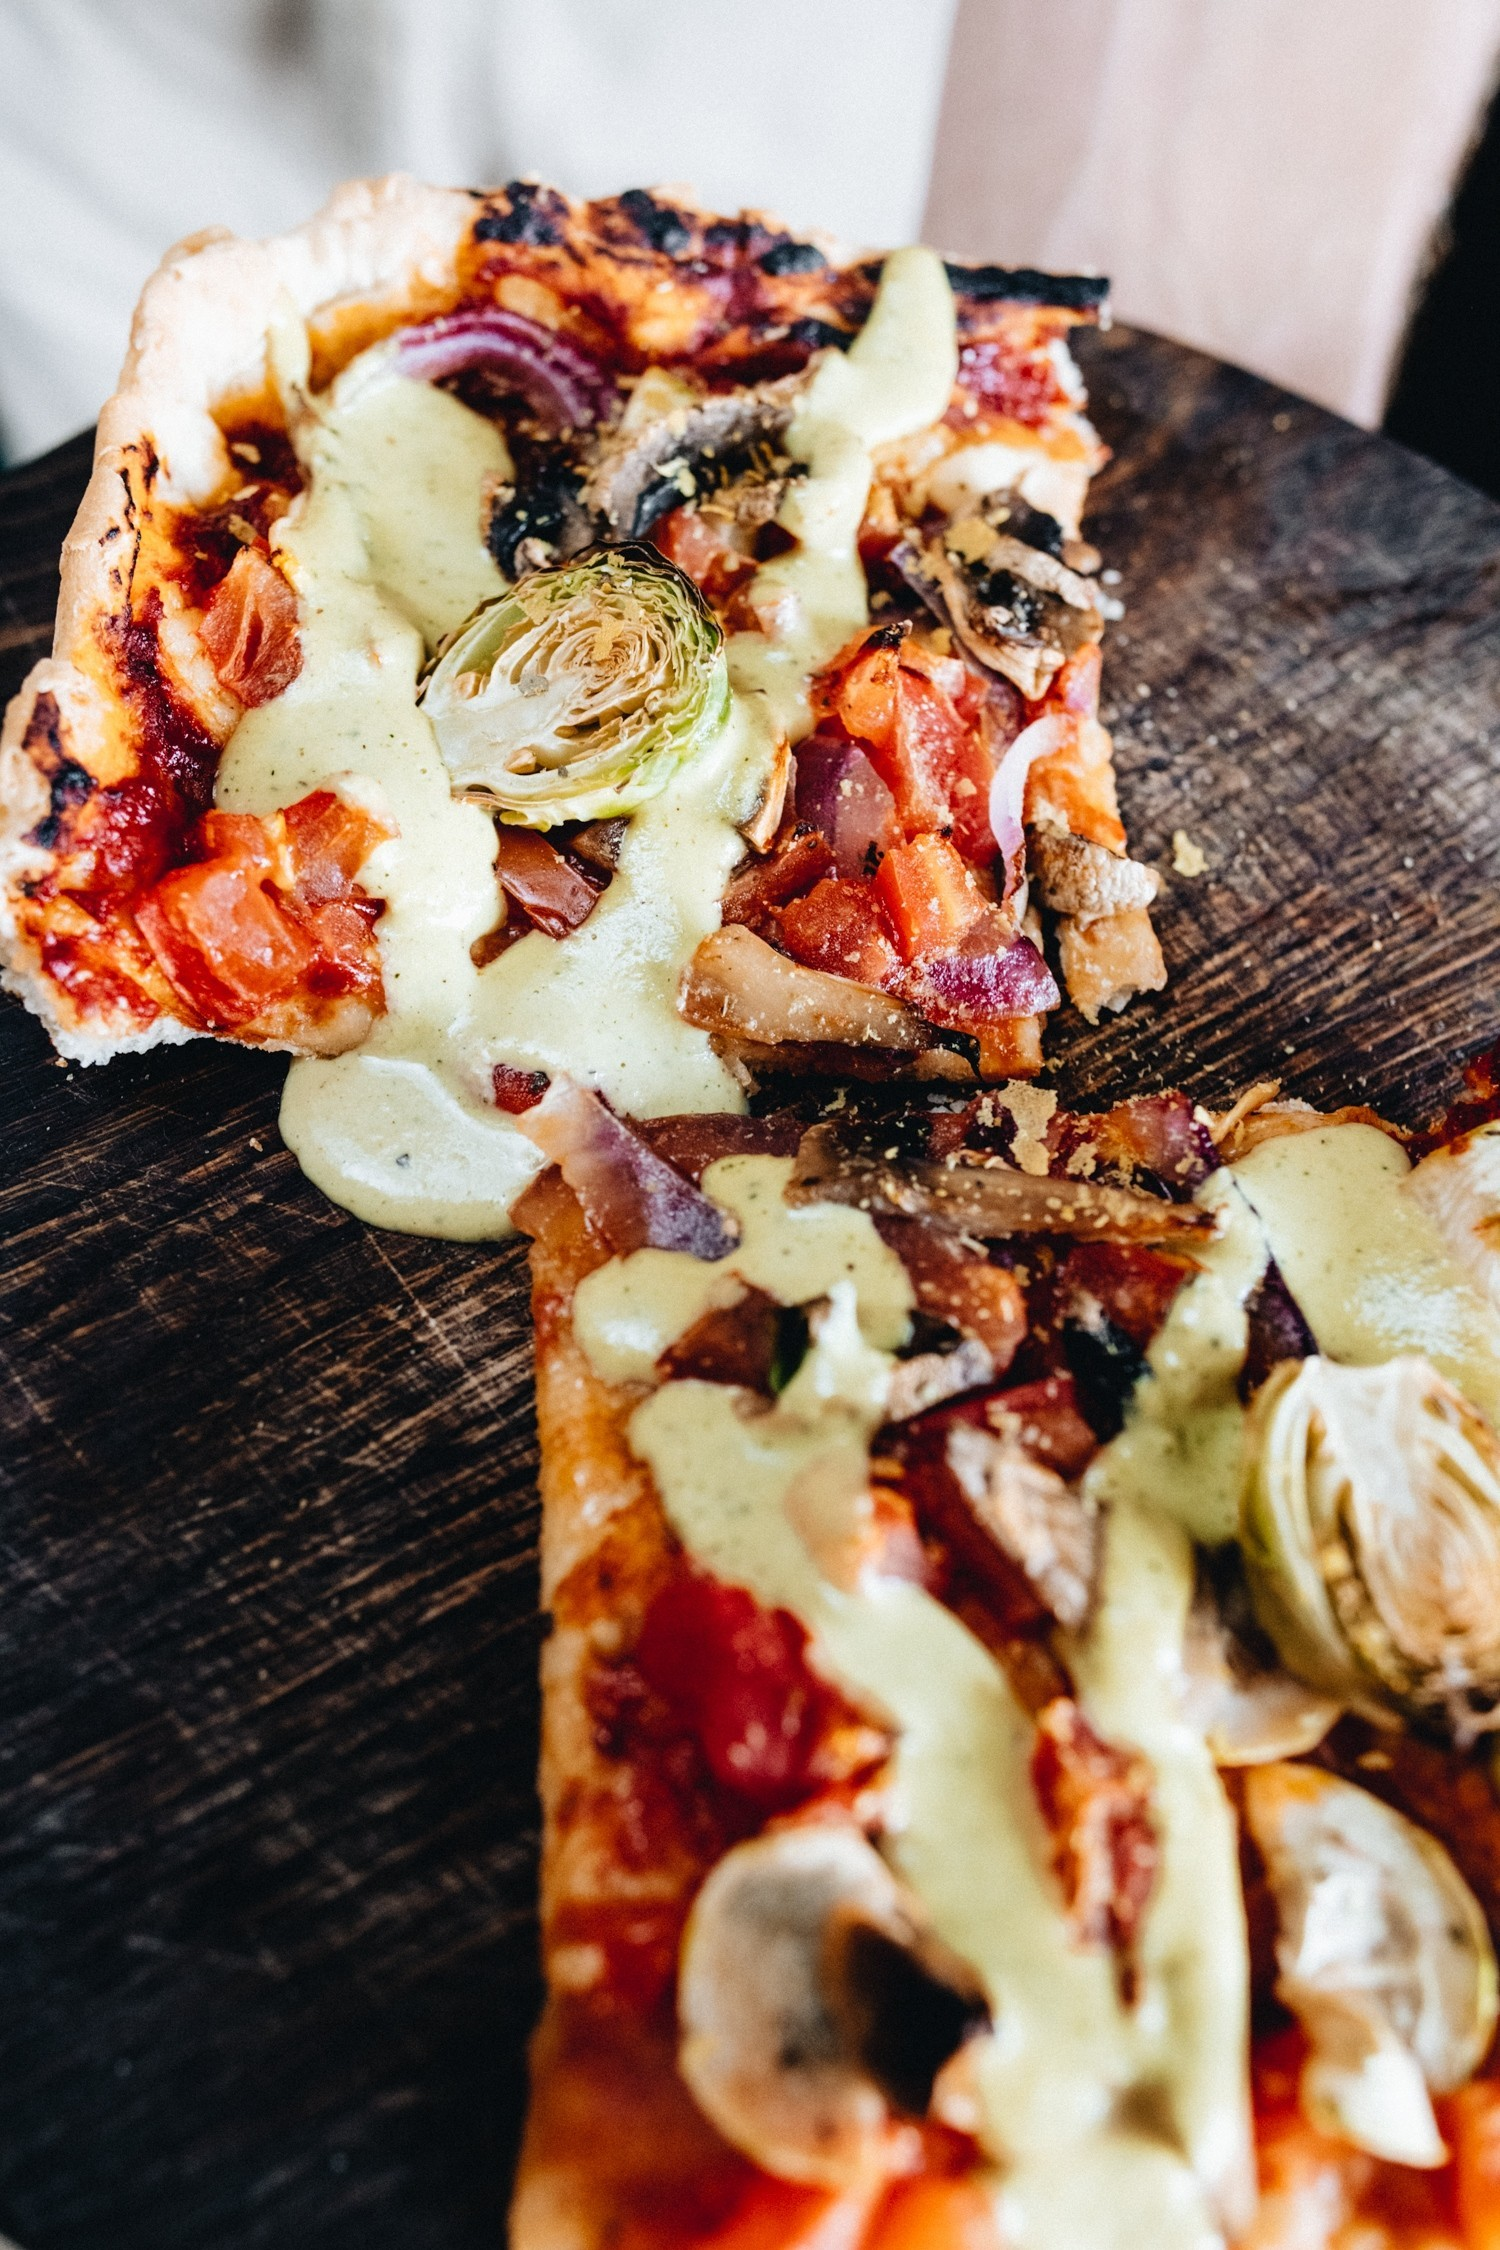 DSC 6829 2 - Italian Veggie Pizza